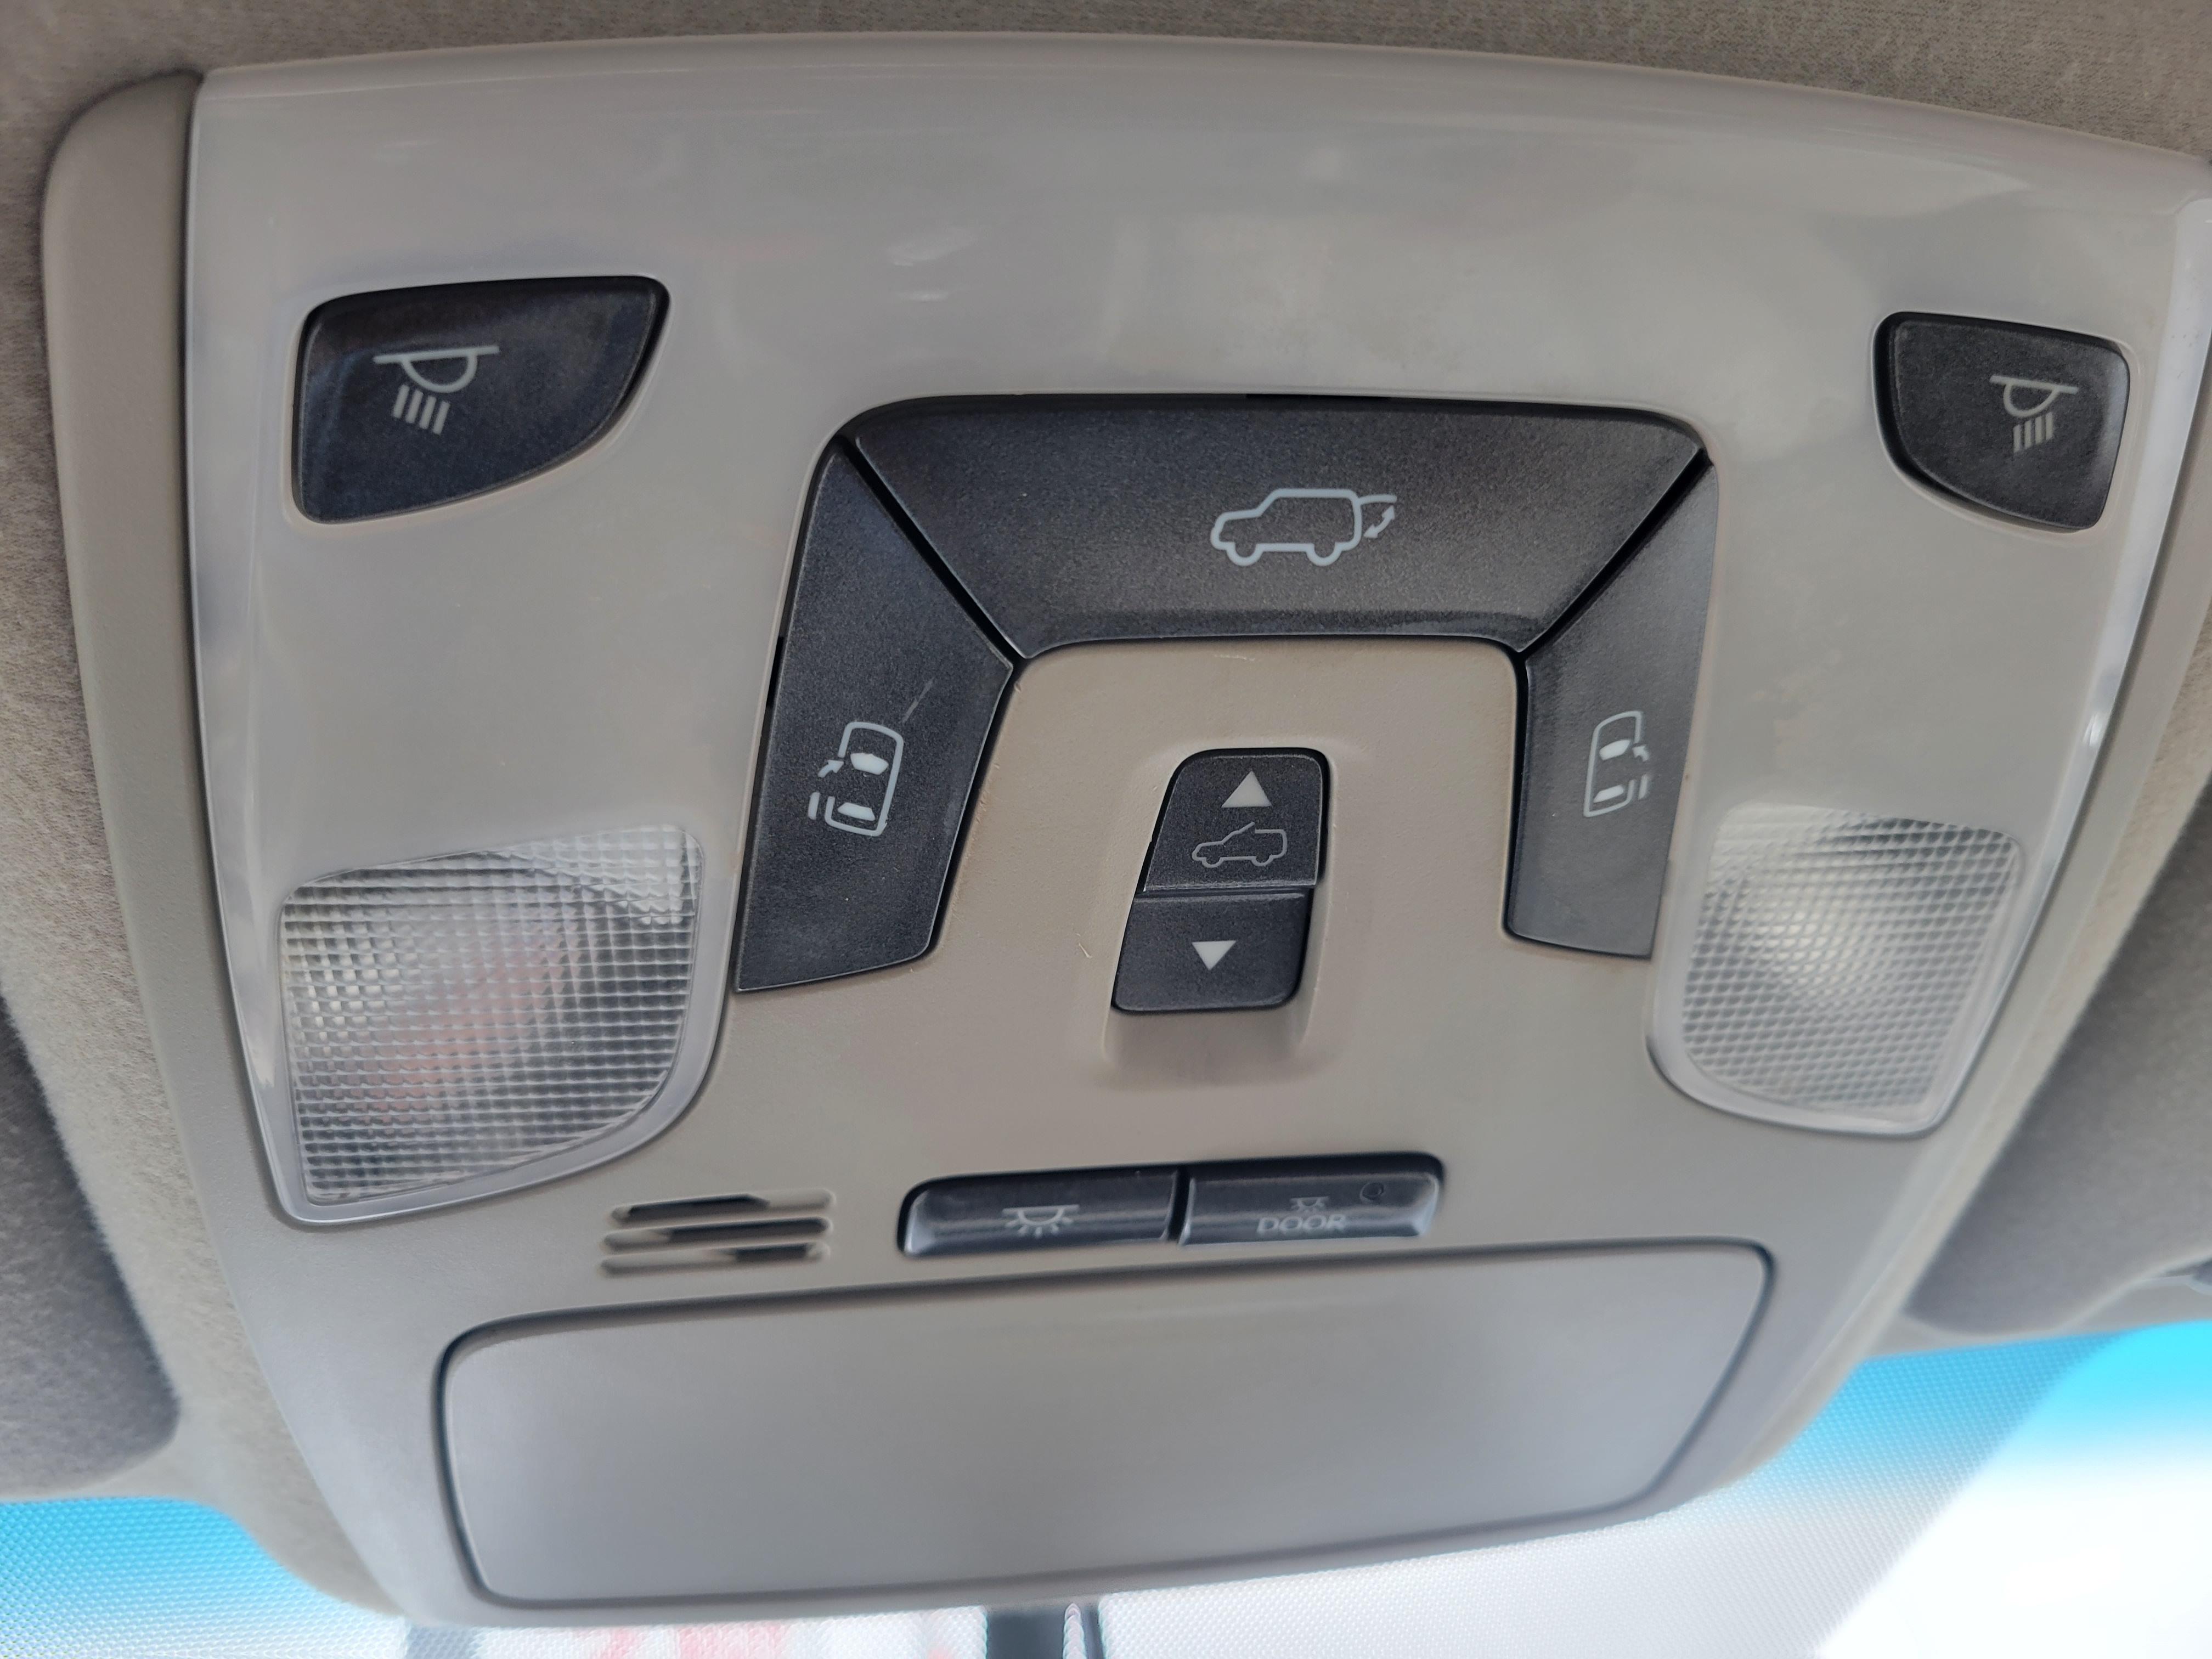 used vehicle - Passenger Van TOYOTA SIENNA 2012